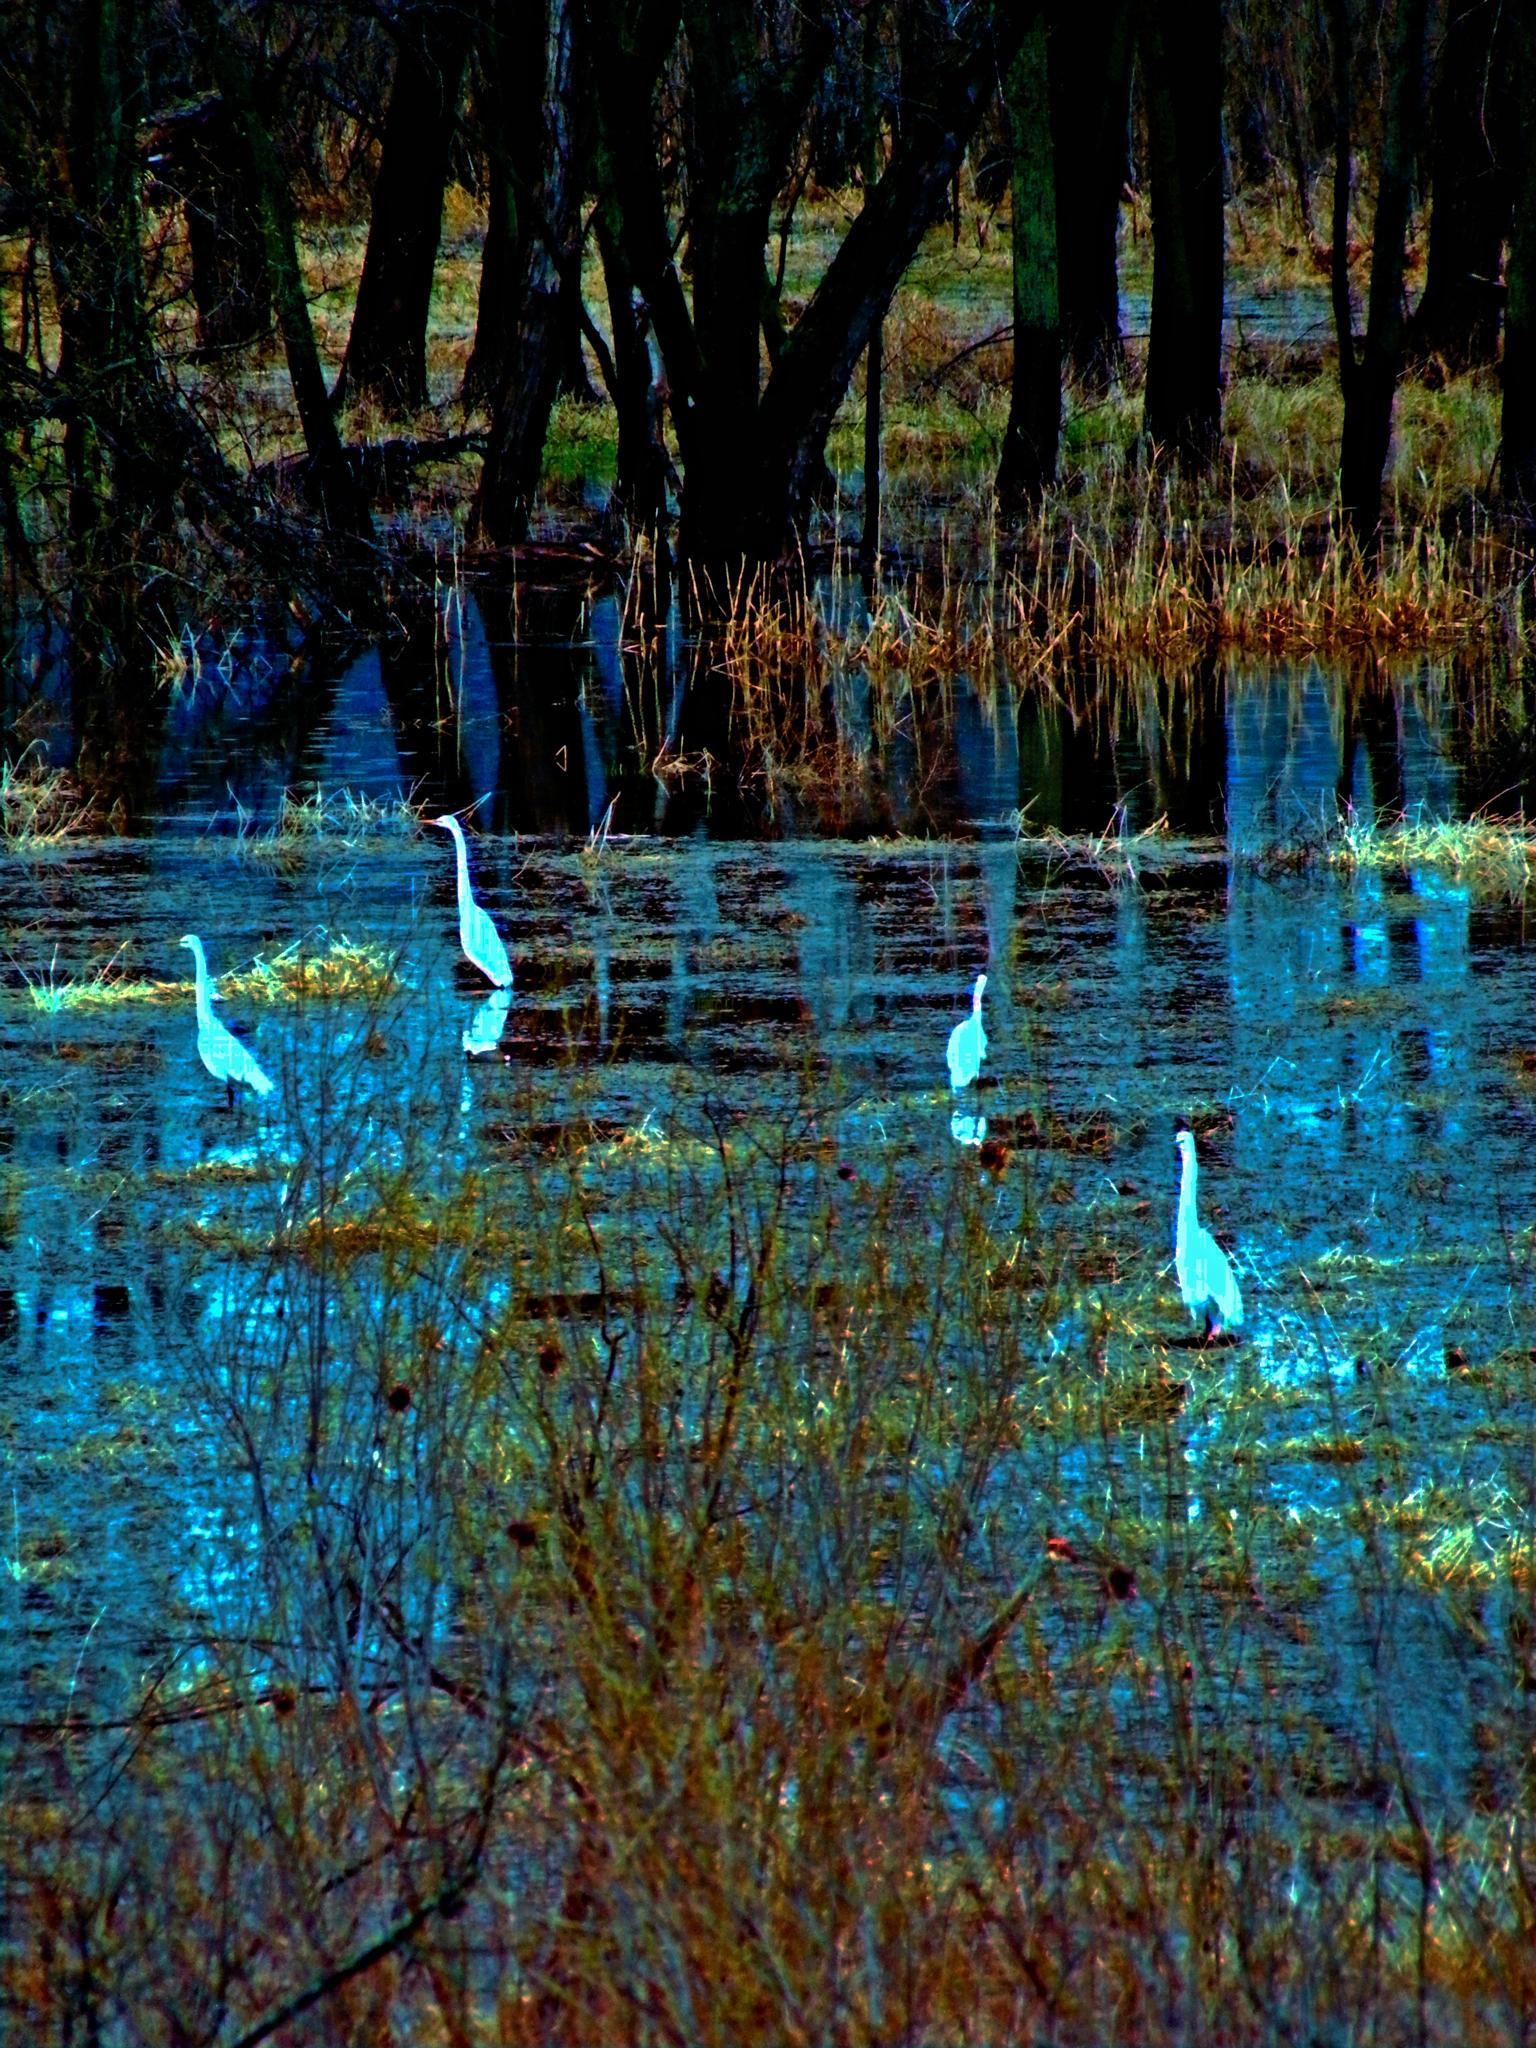 5 Cranes by Buffalo